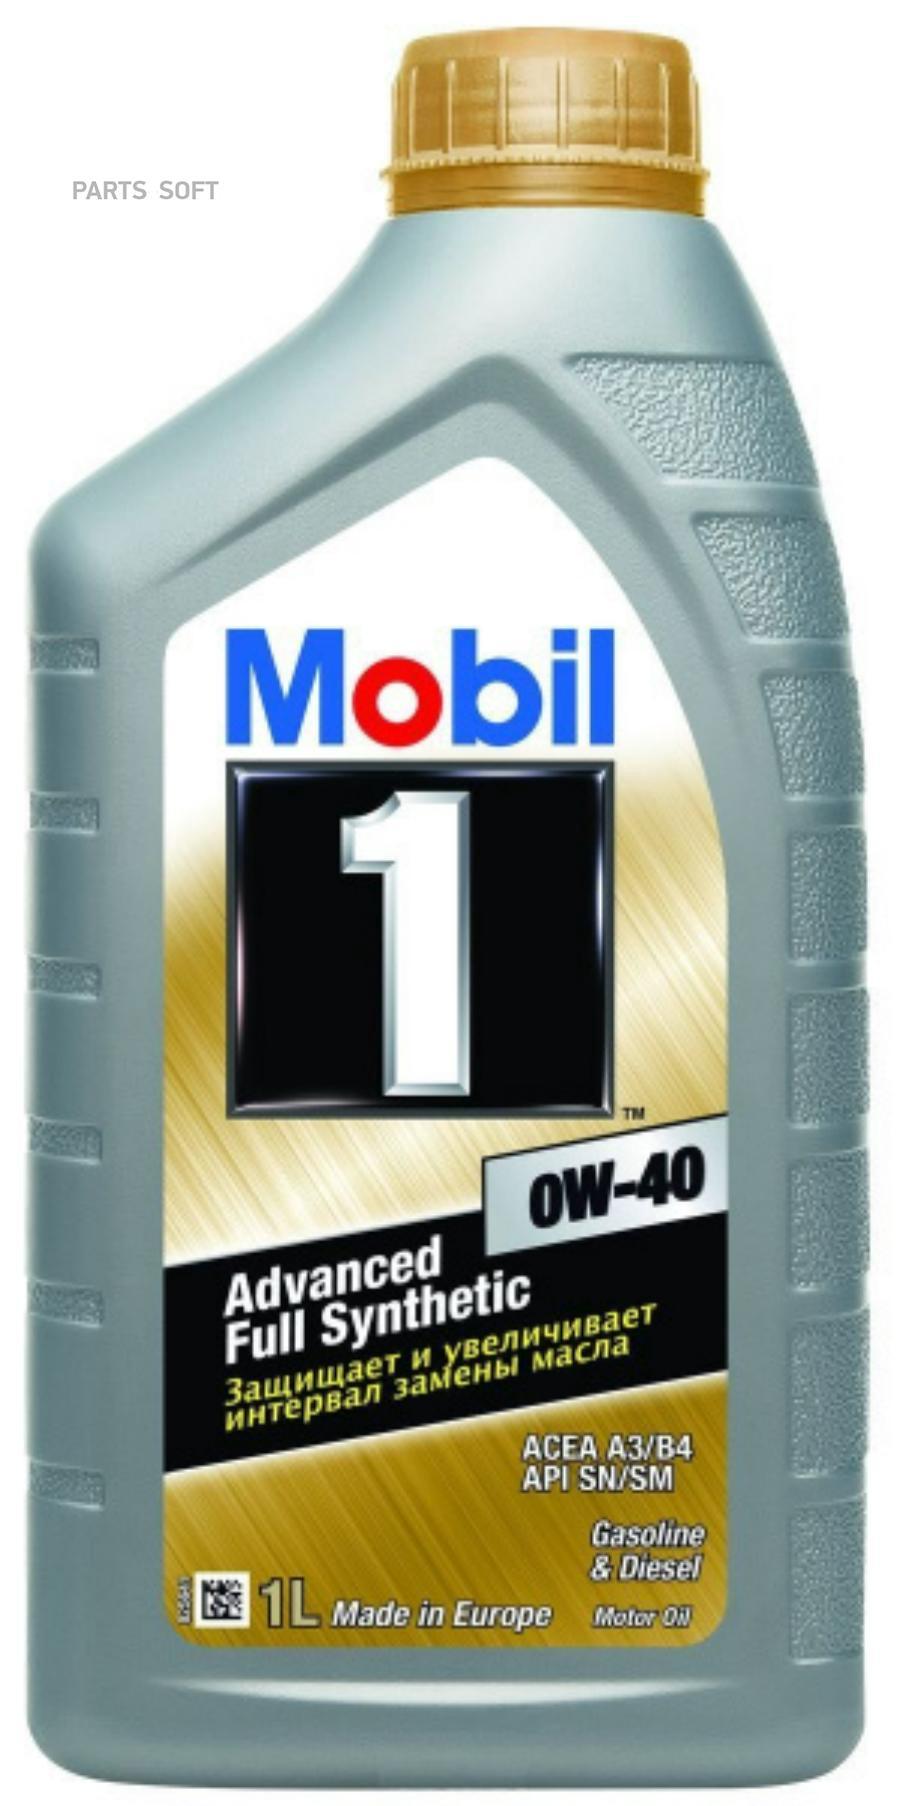 Масло моторное синтетическое Mobil 1 0W-40, 1л